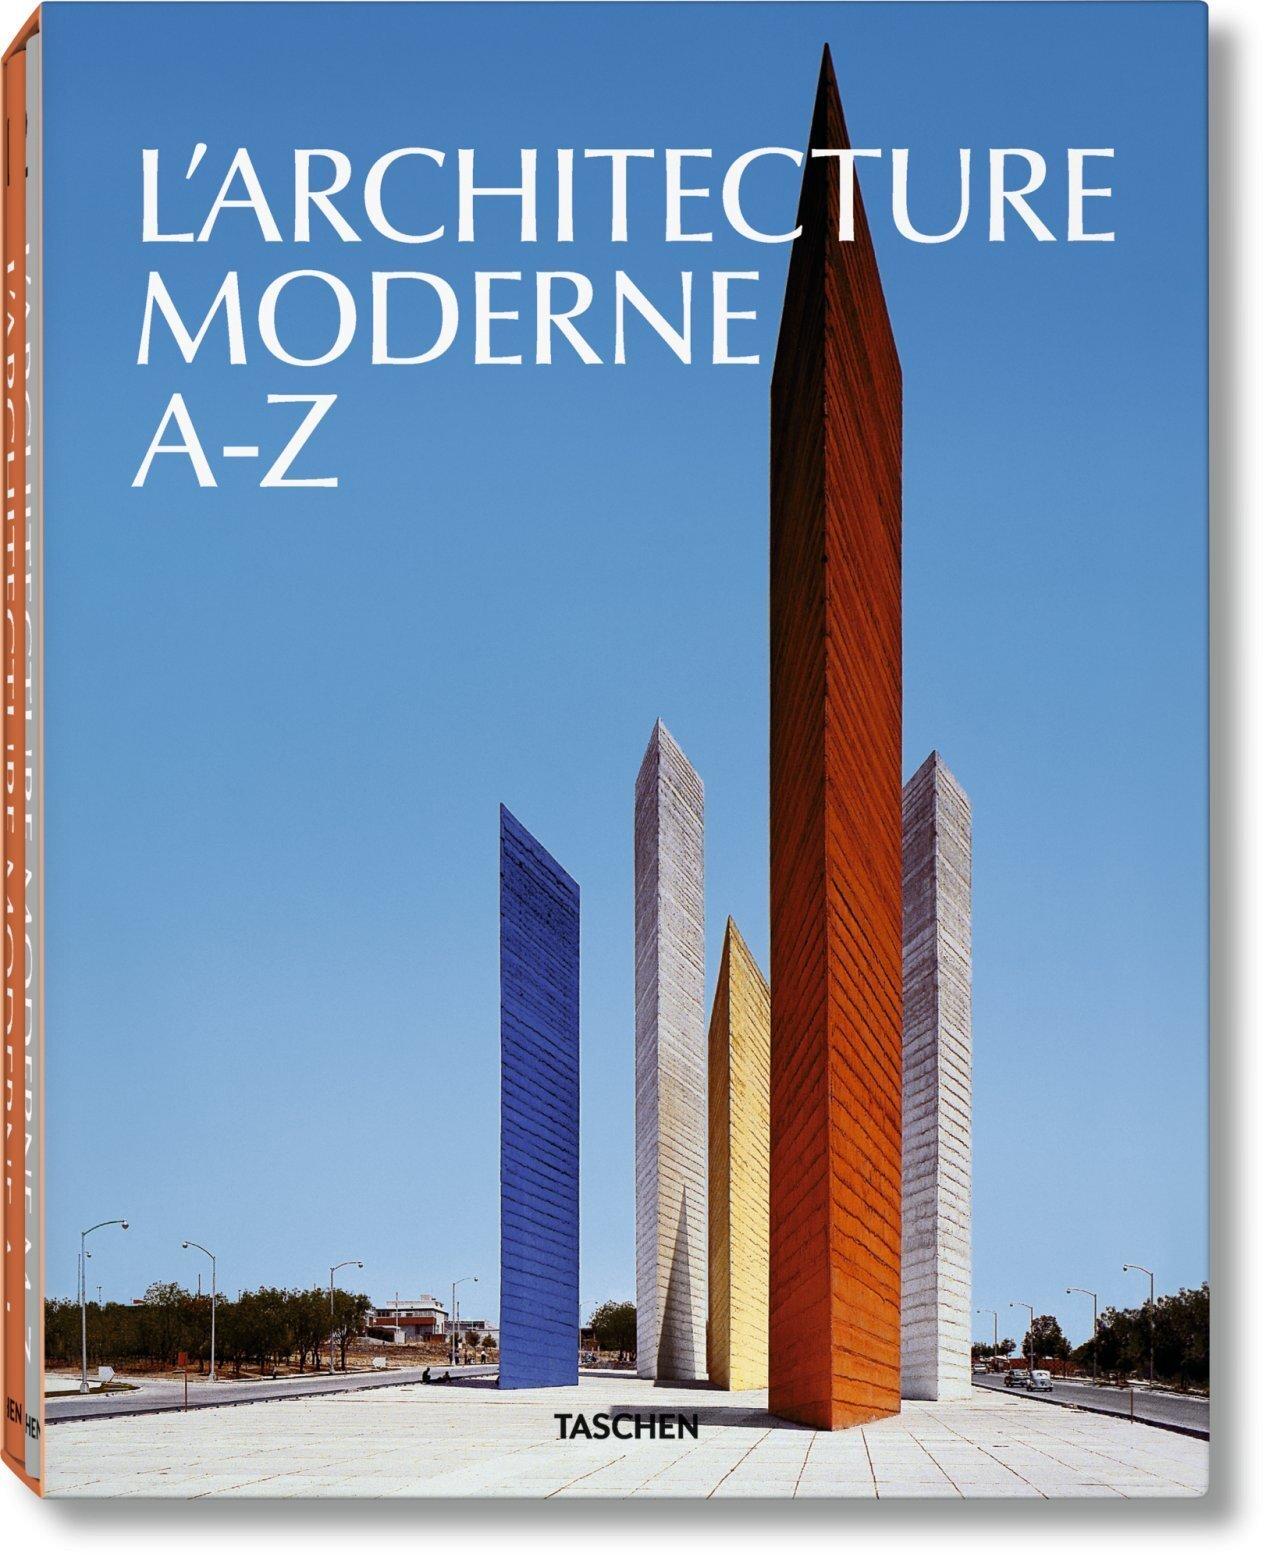 JU-GO ARCHITECTURE MODERNE A-Z, 2 VOL.